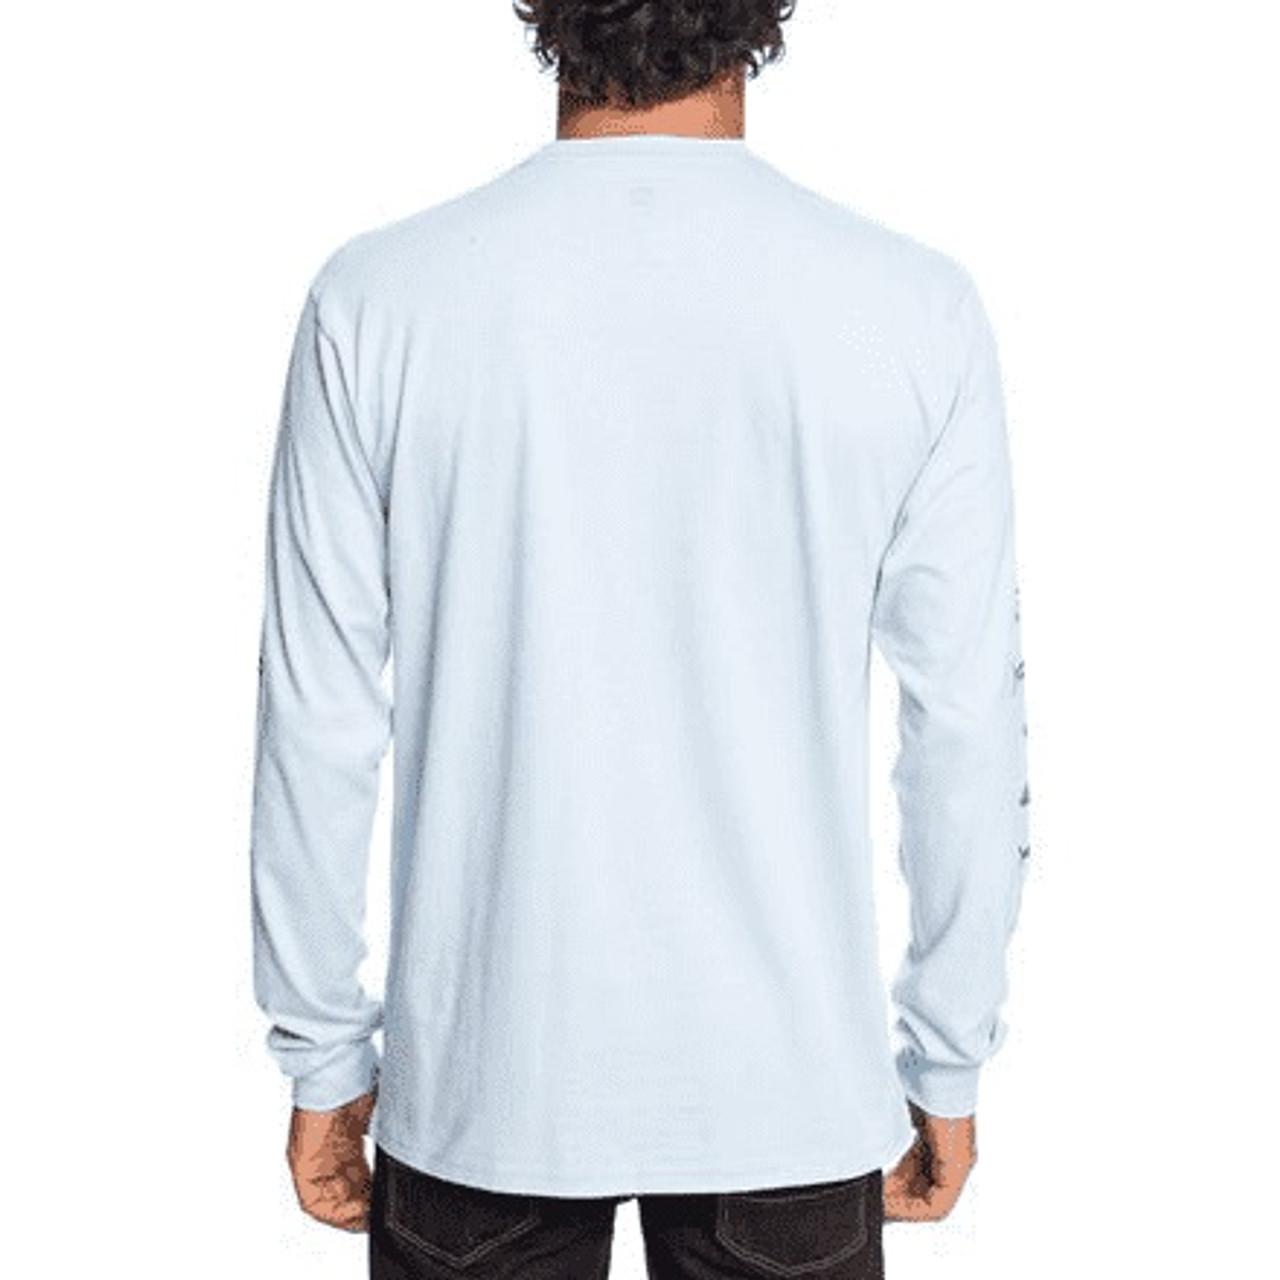 White All Sizes Quiksilver Mens Quick Bone T-shirt Long Sleeve